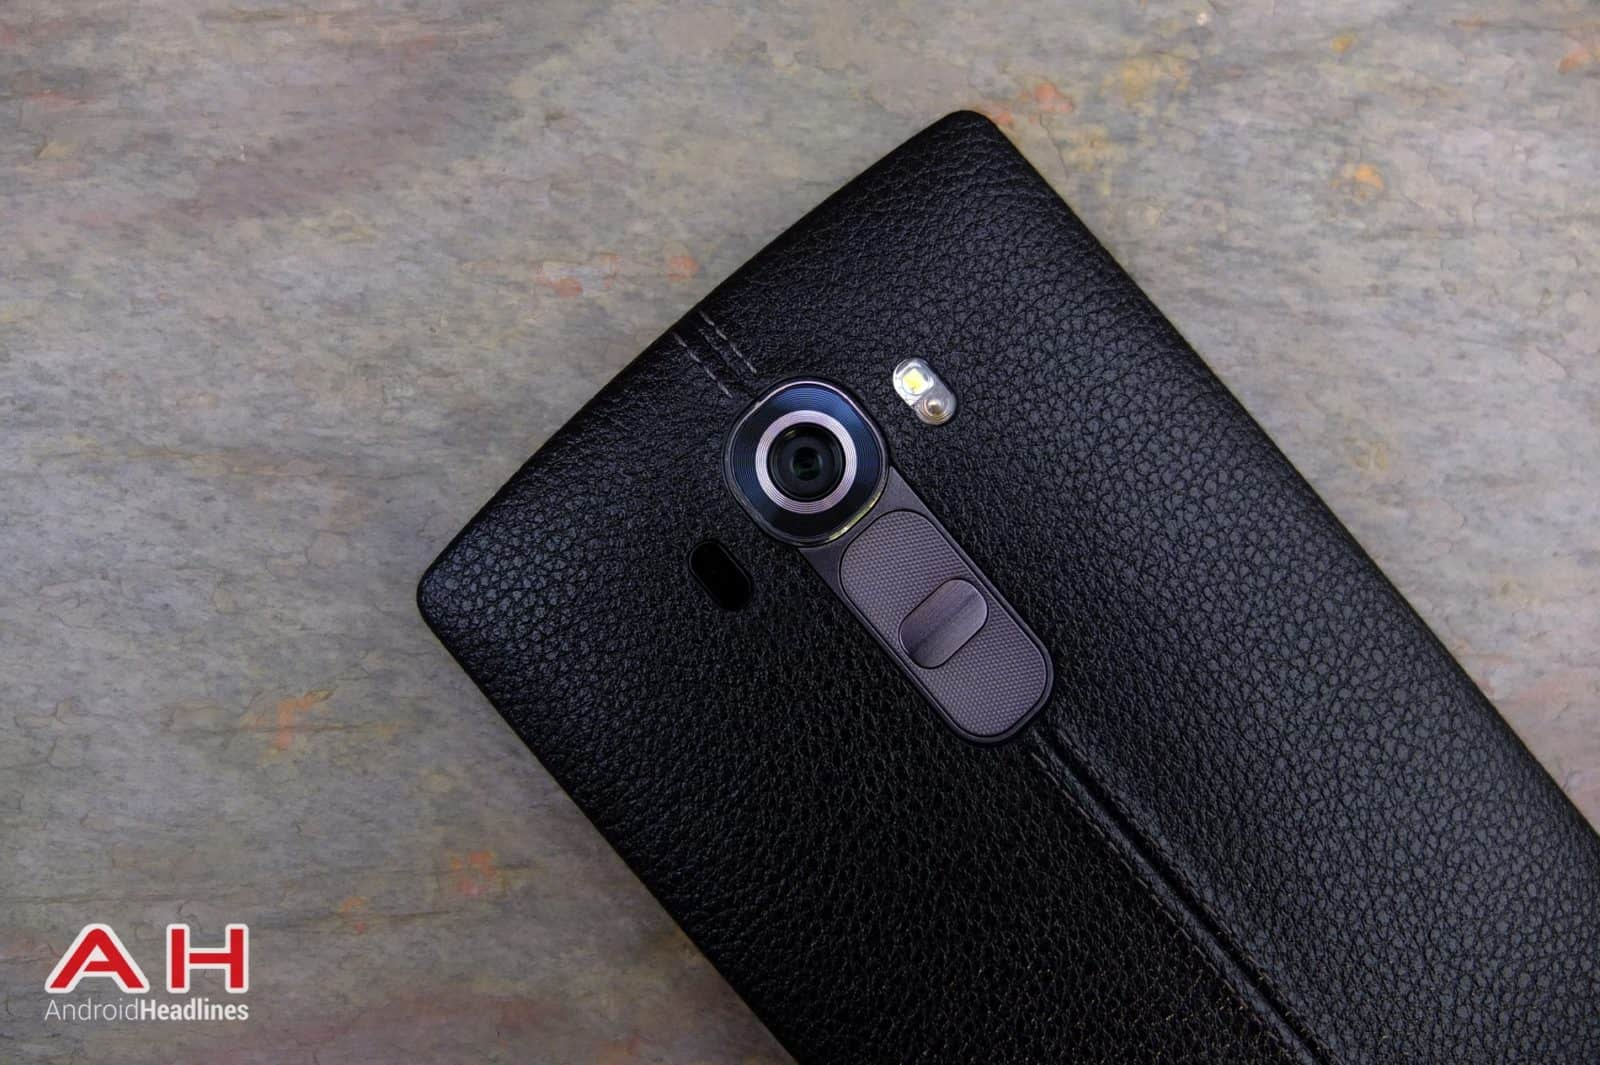 LG G4 BlackLeather TD AH 15